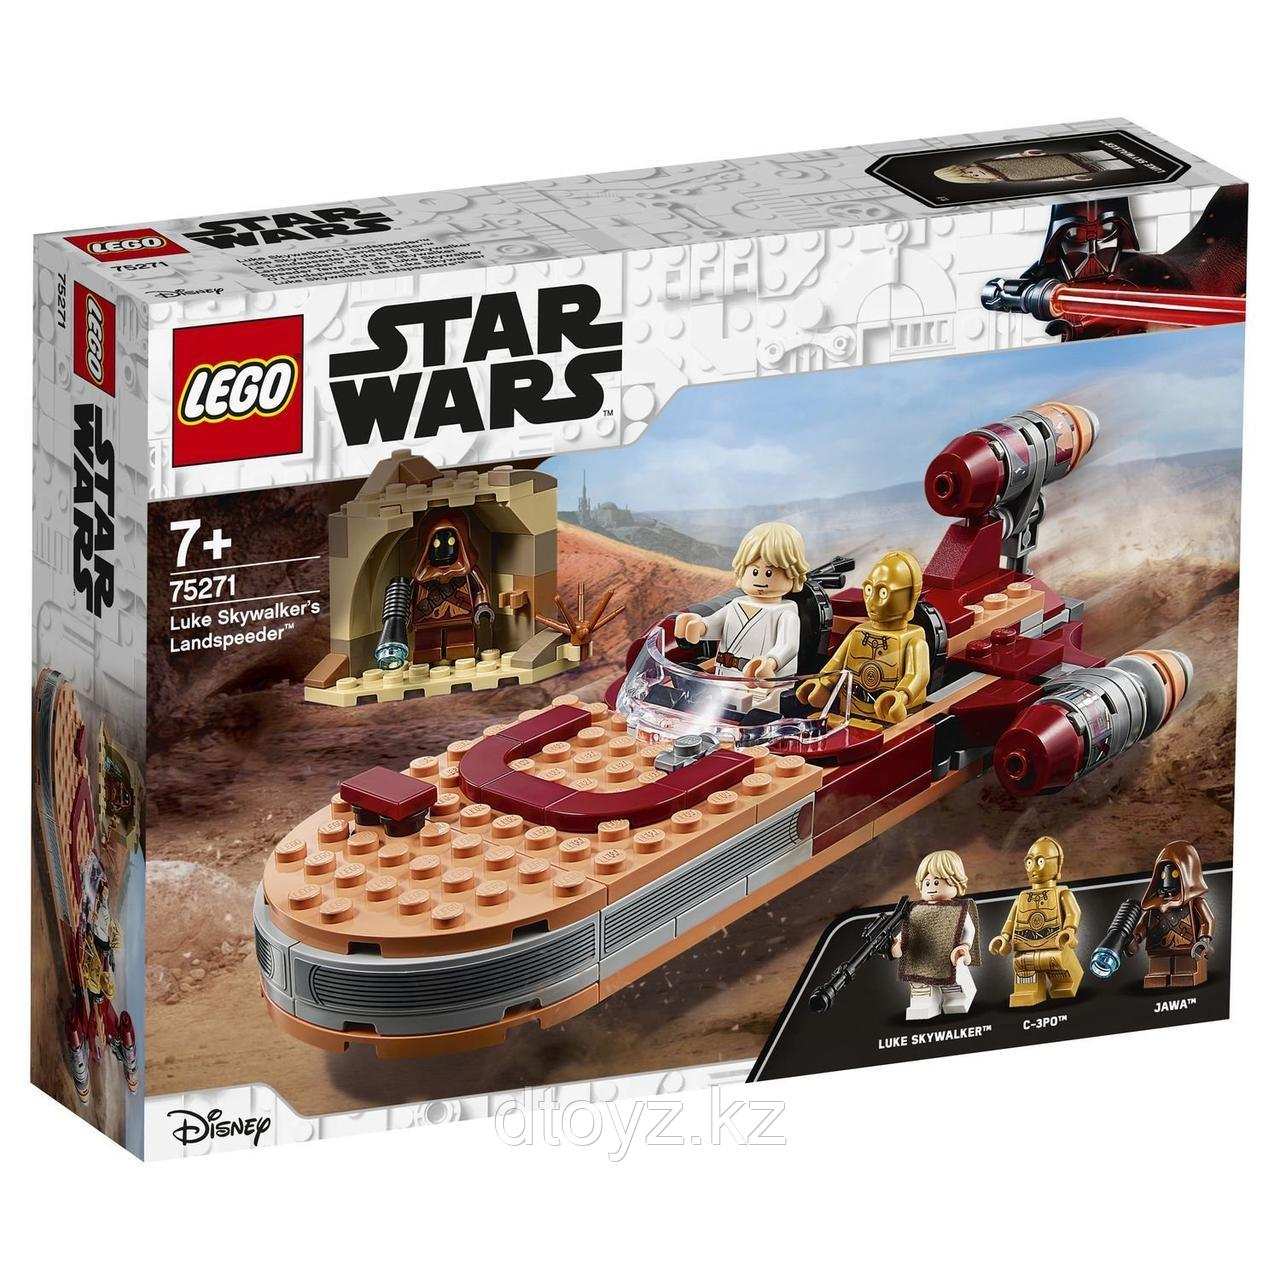 Lego Star Wars 75271 Спидер Люка Сайуокера